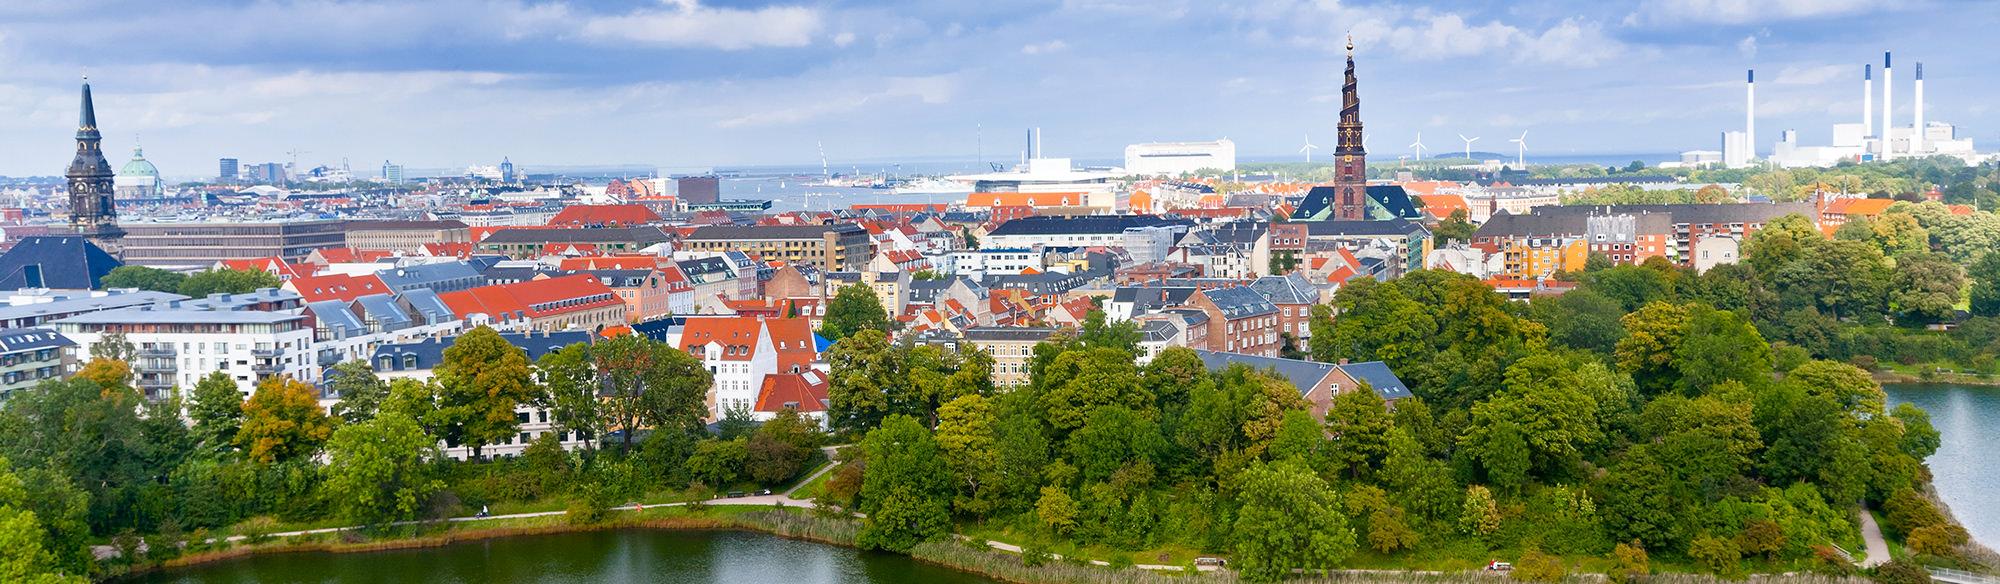 Copenaghen capitale green